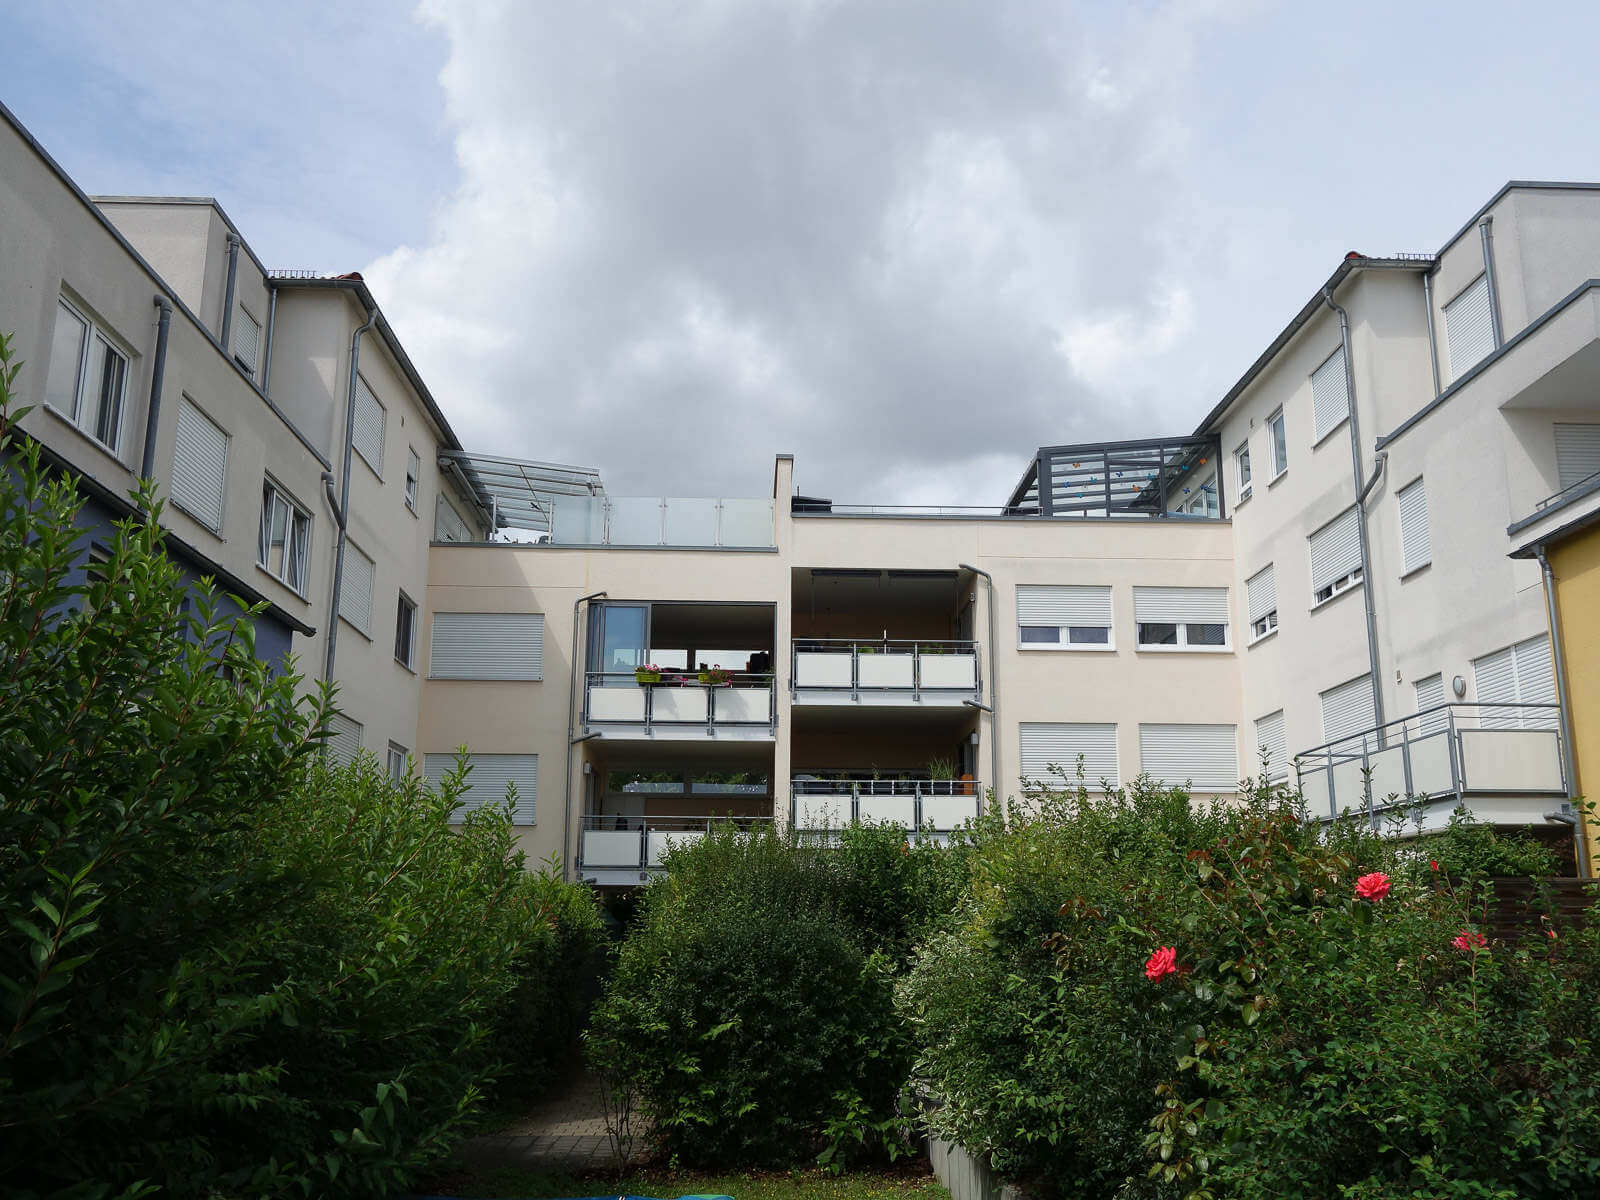 Balkone, Neubau Mehrfamilienhäuser in Kornwestheim